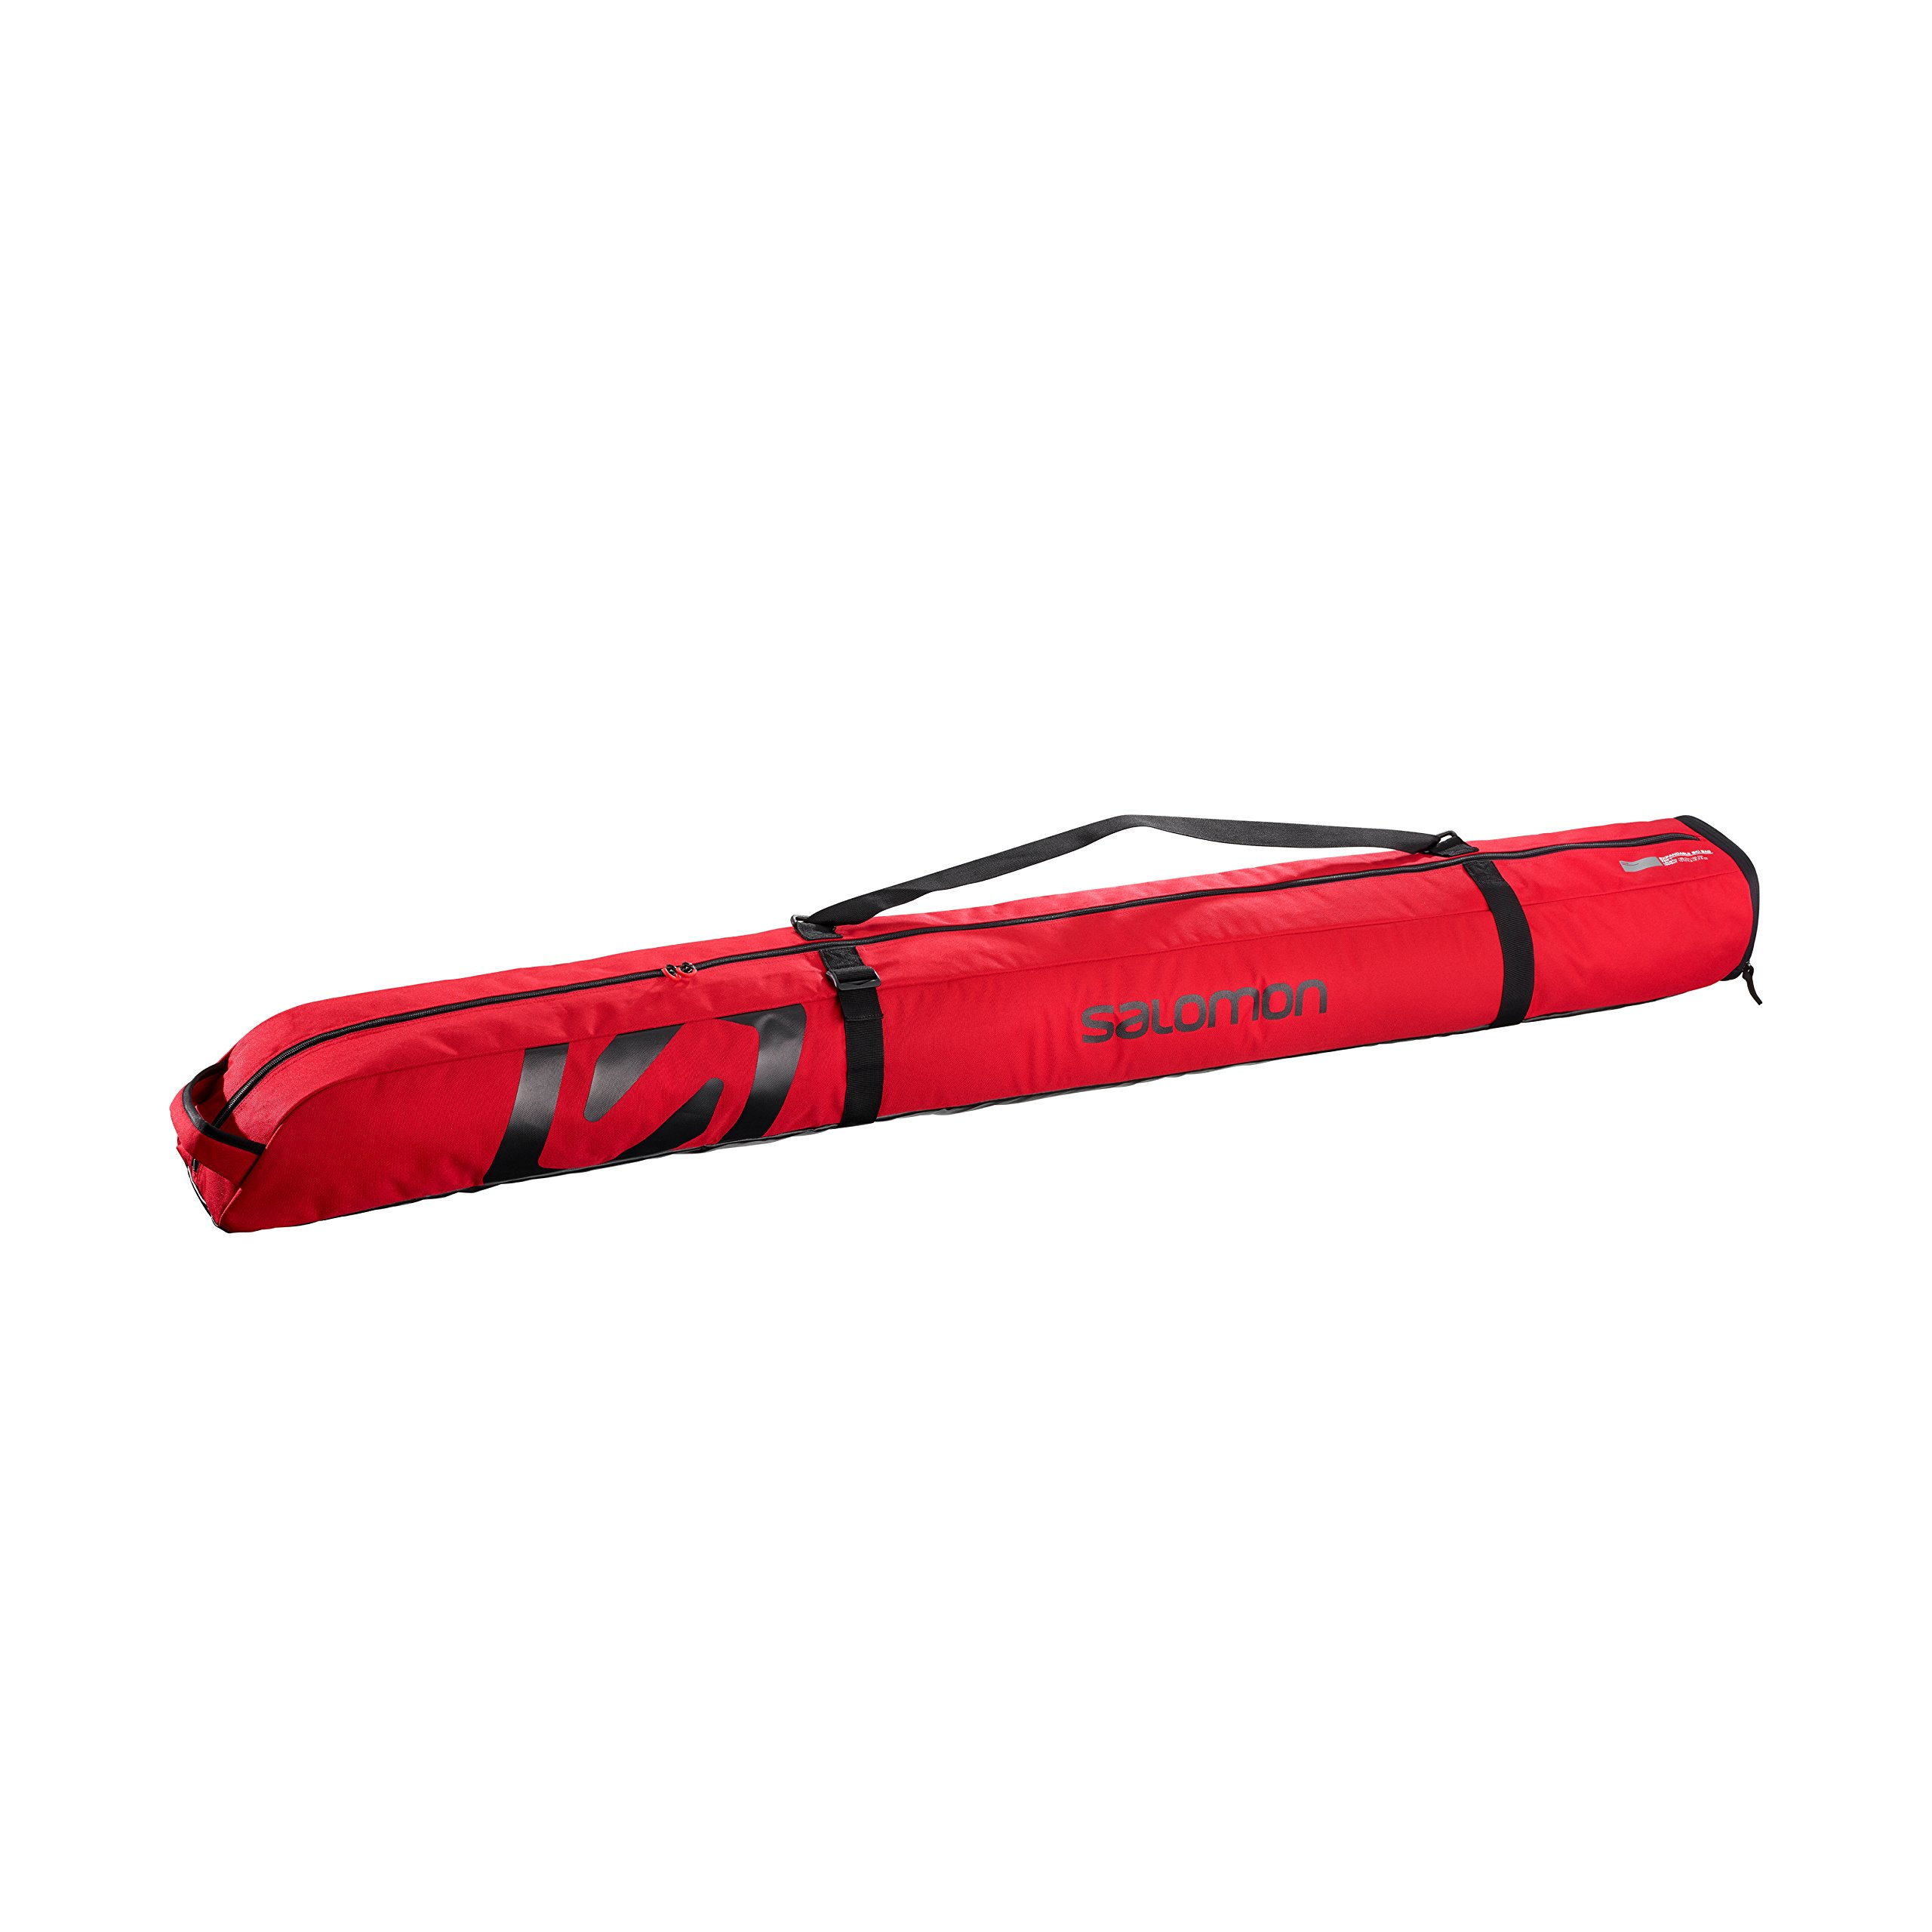 Salomon Extend 1P Pad 165+20 Ski Bag, Barbados Cherry/Black